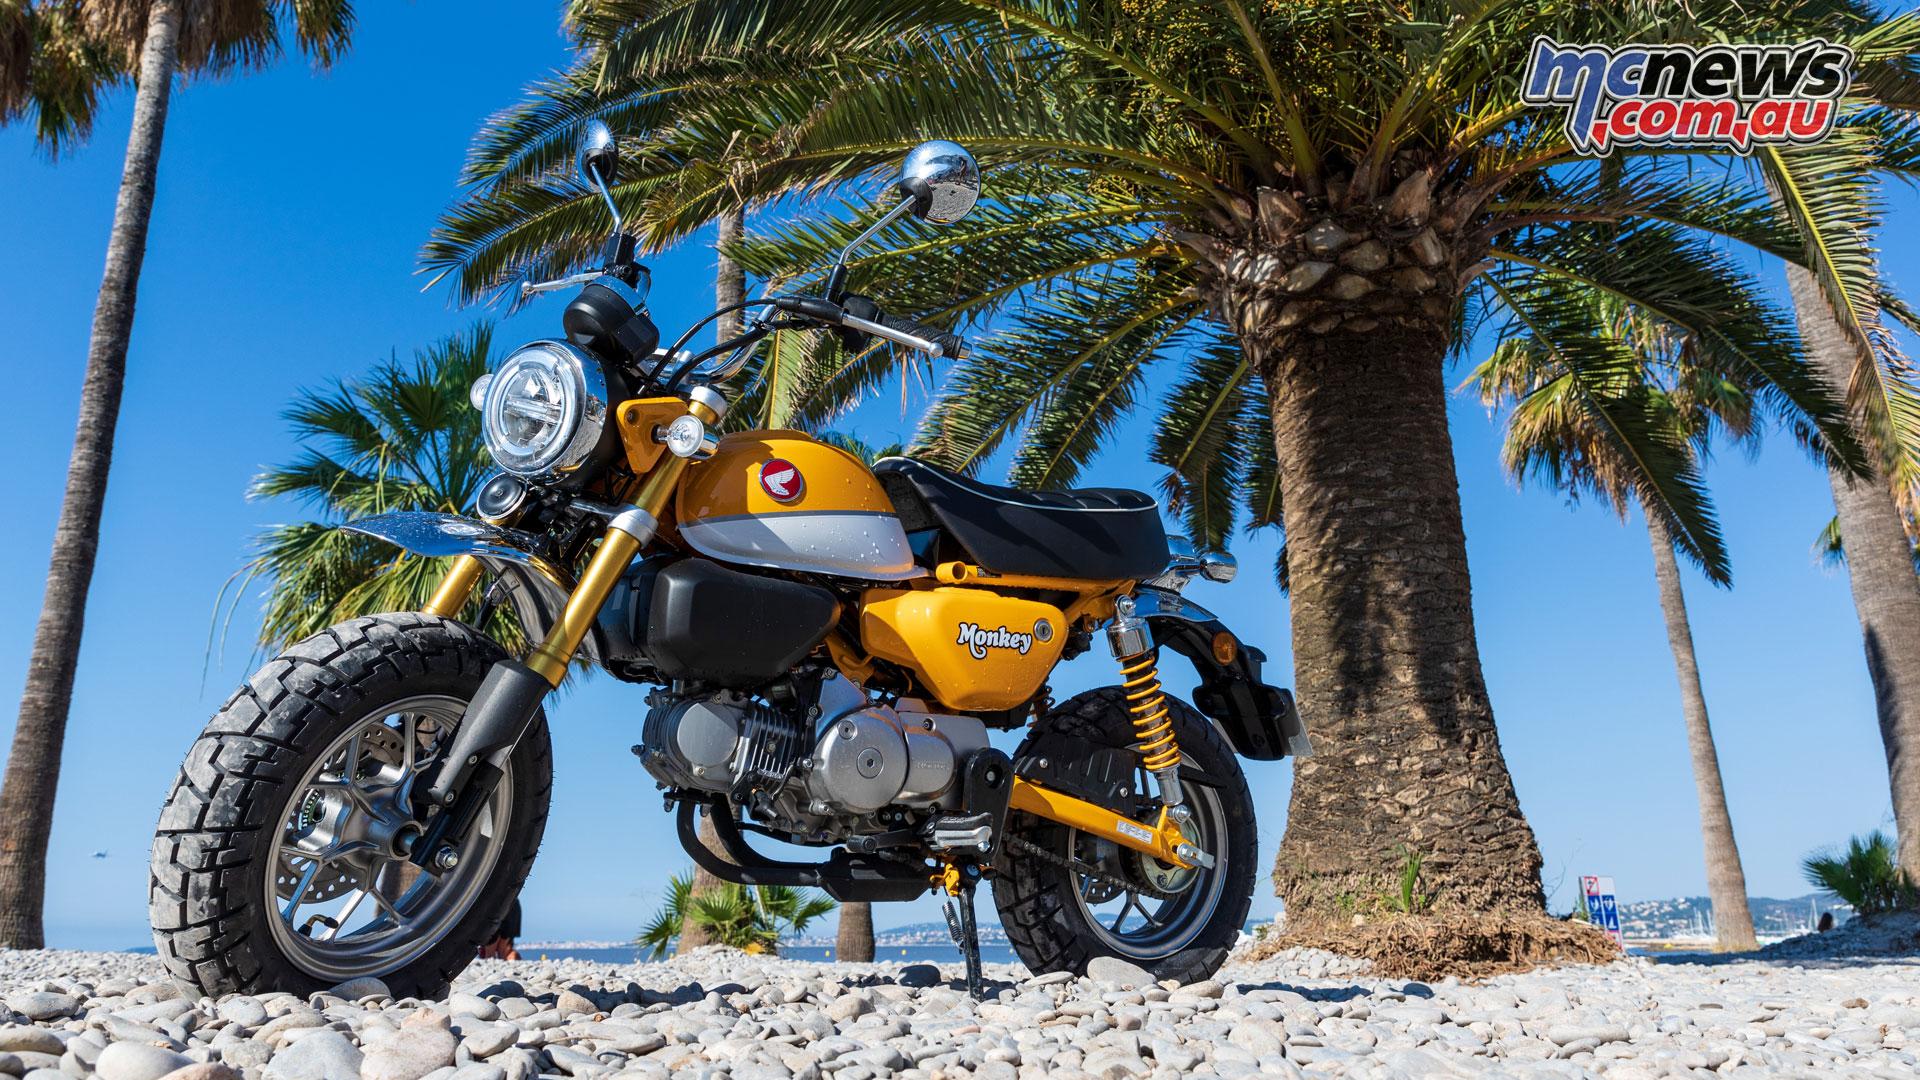 Monkey Magic Honda Monkey 125 Bike Arrvies At 4999 Mcnews Com Au